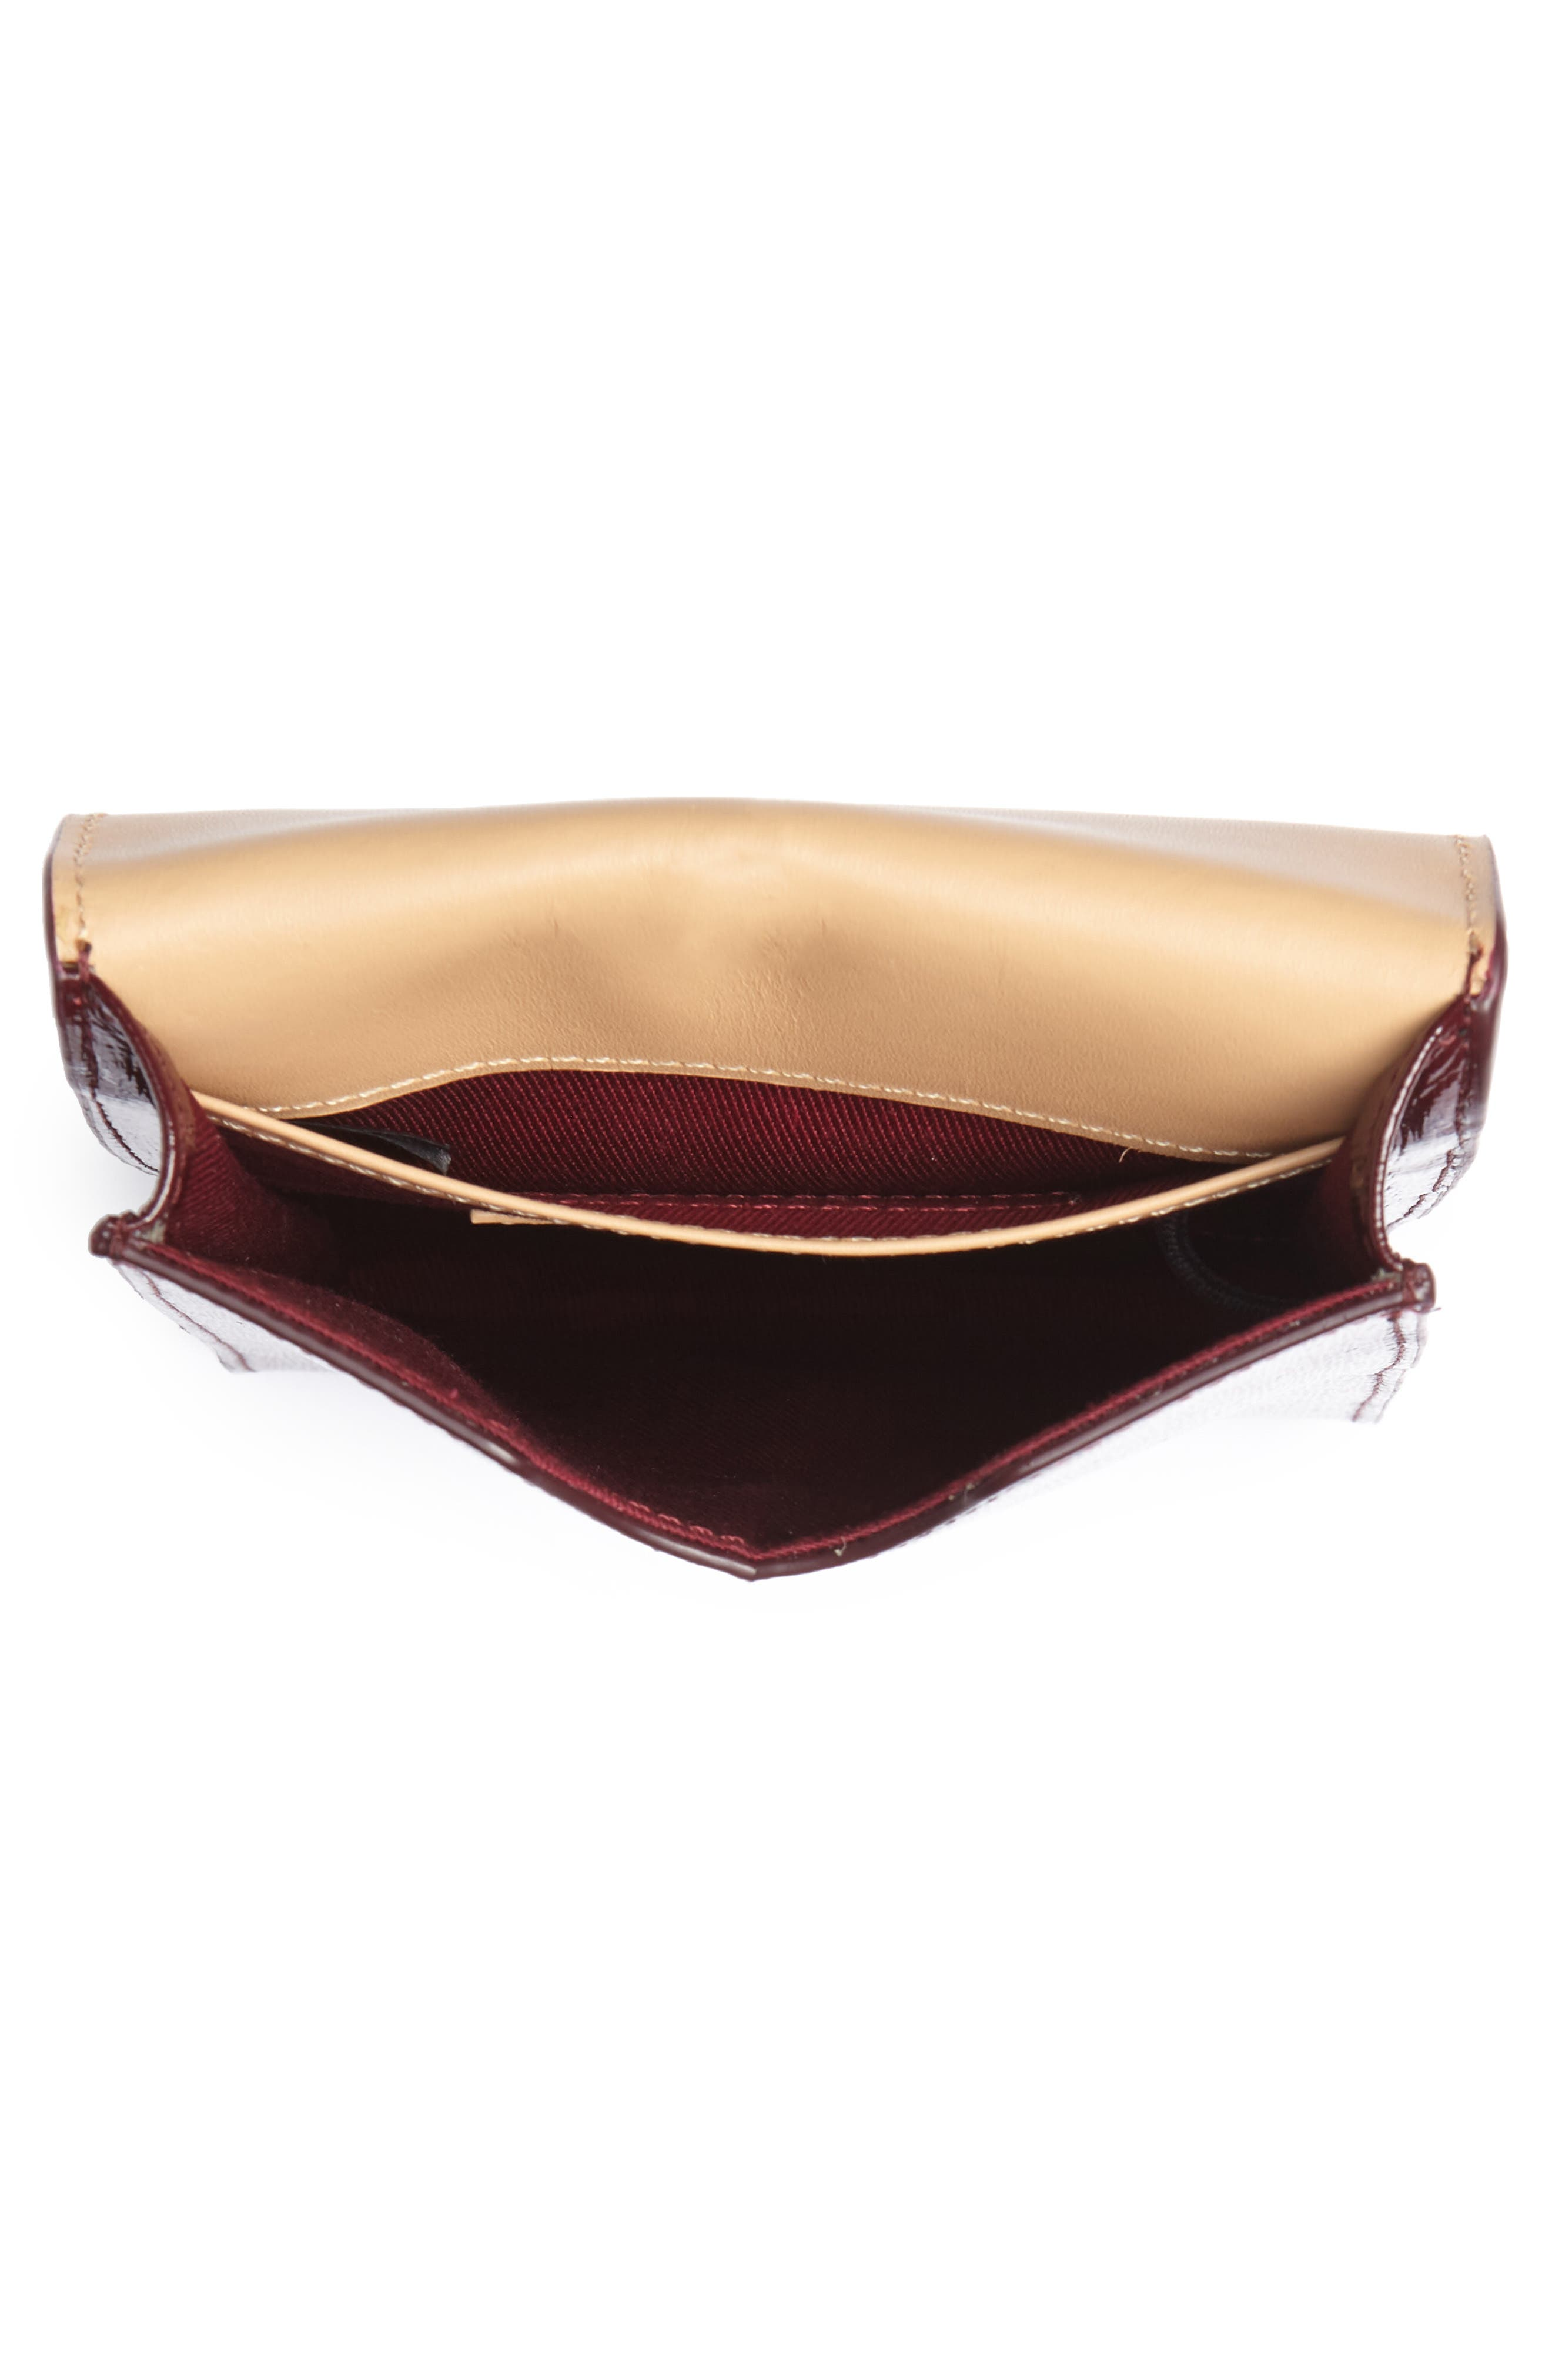 Leather Phone Crossbody Bag,                             Alternate thumbnail 4, color,                             Burgundy Royale